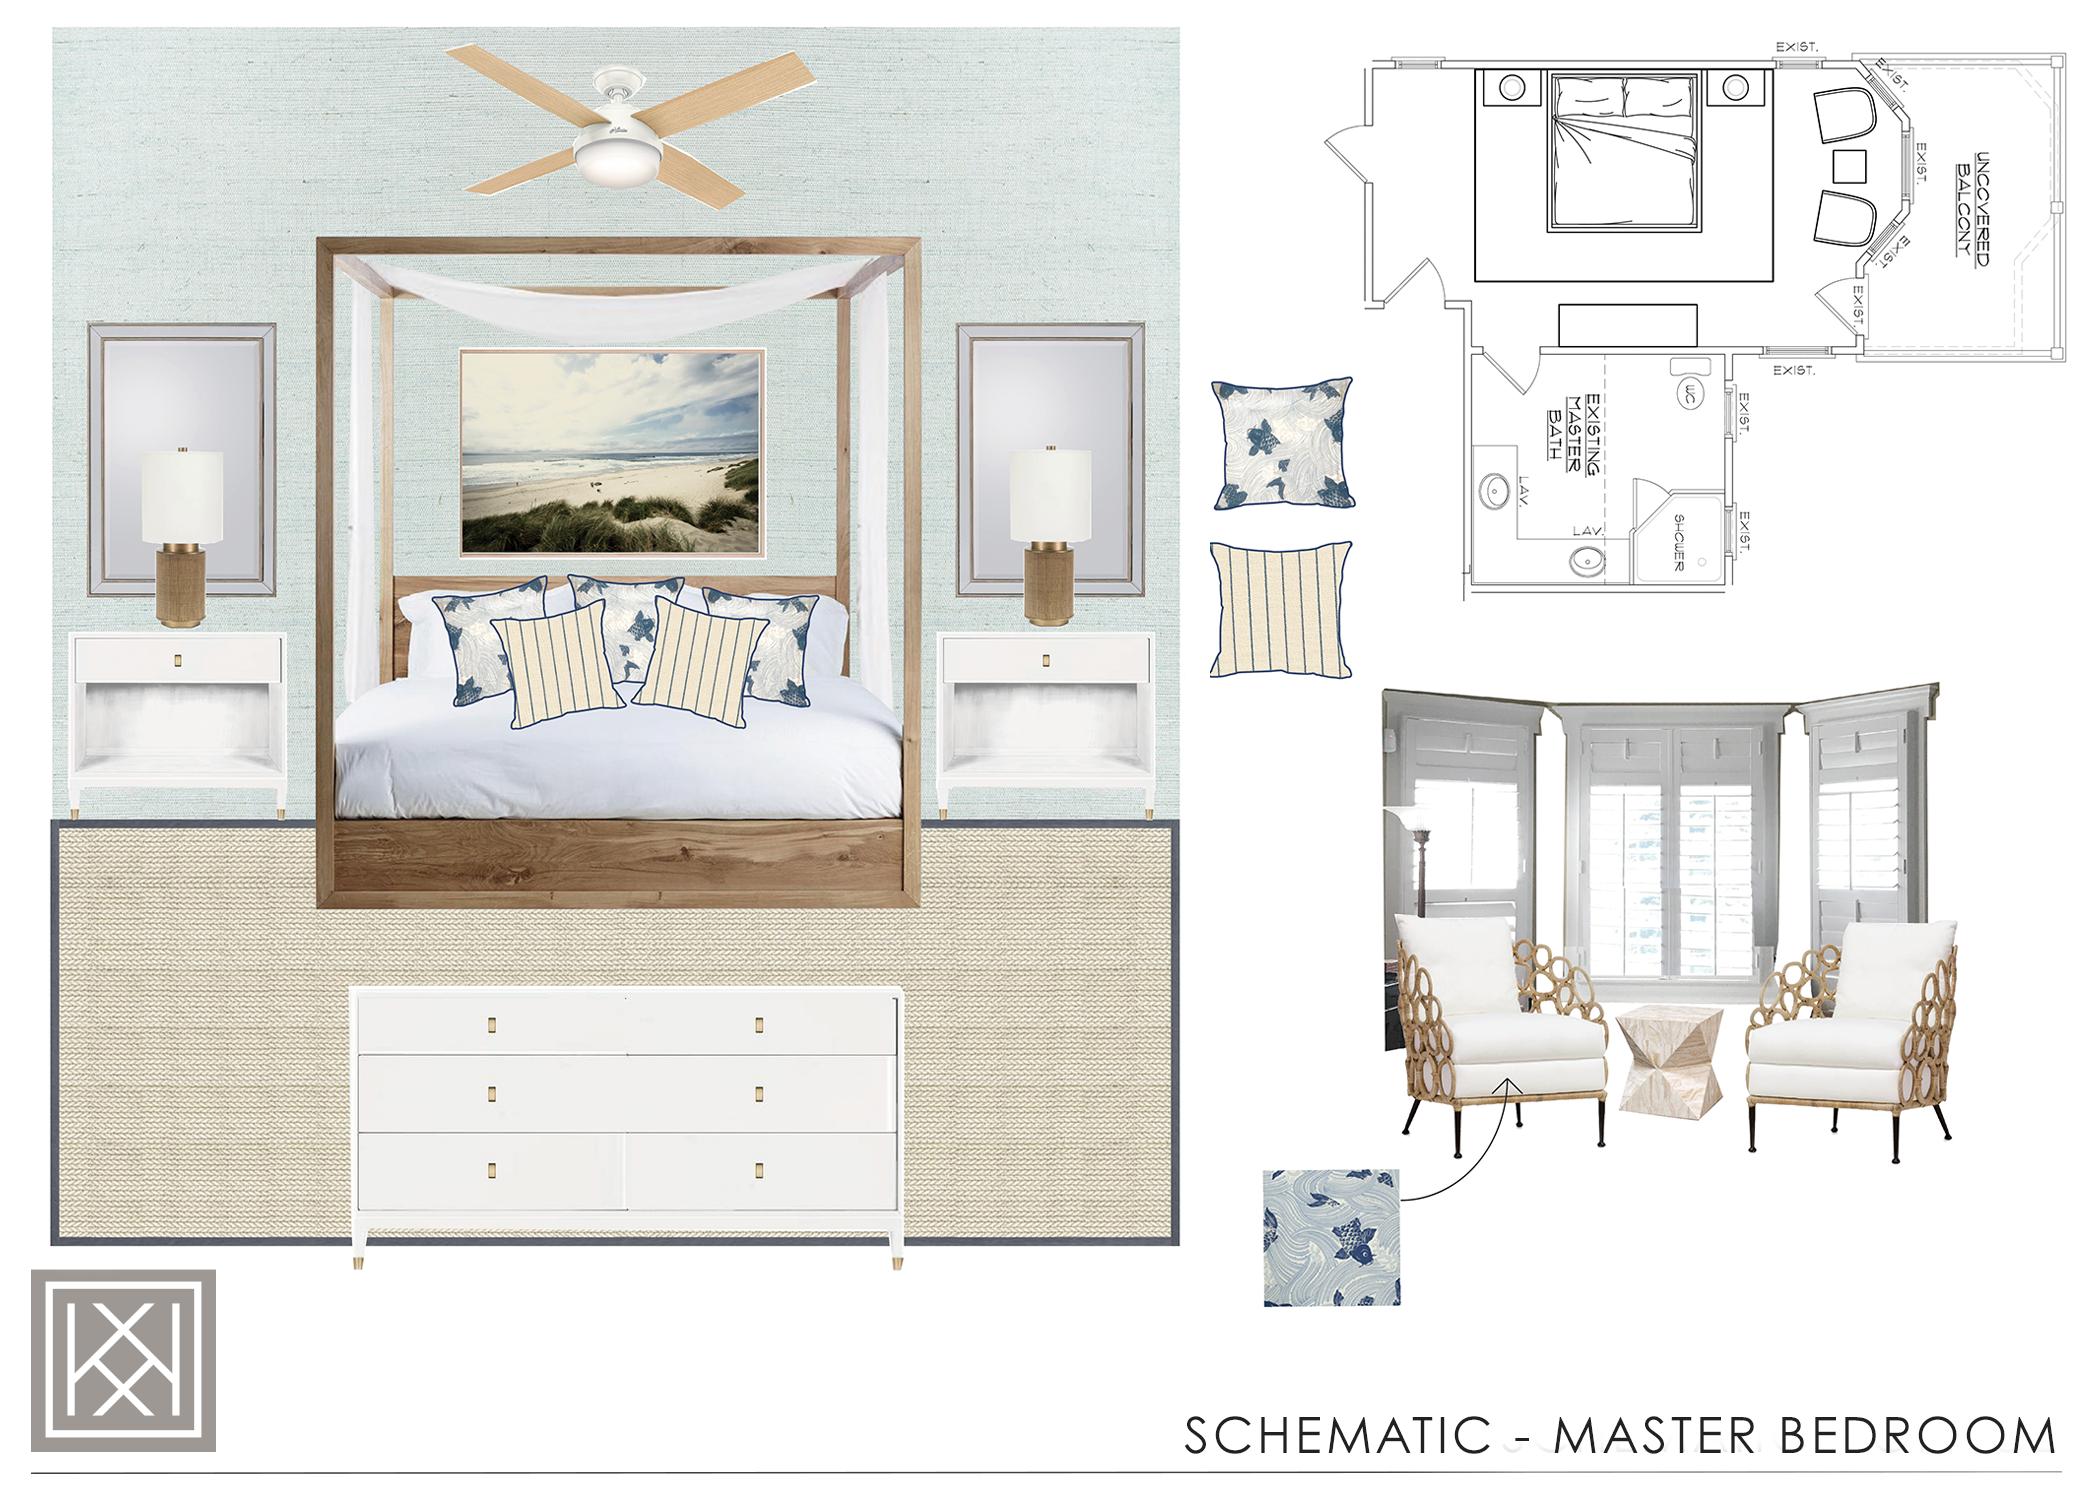 interior design schematic